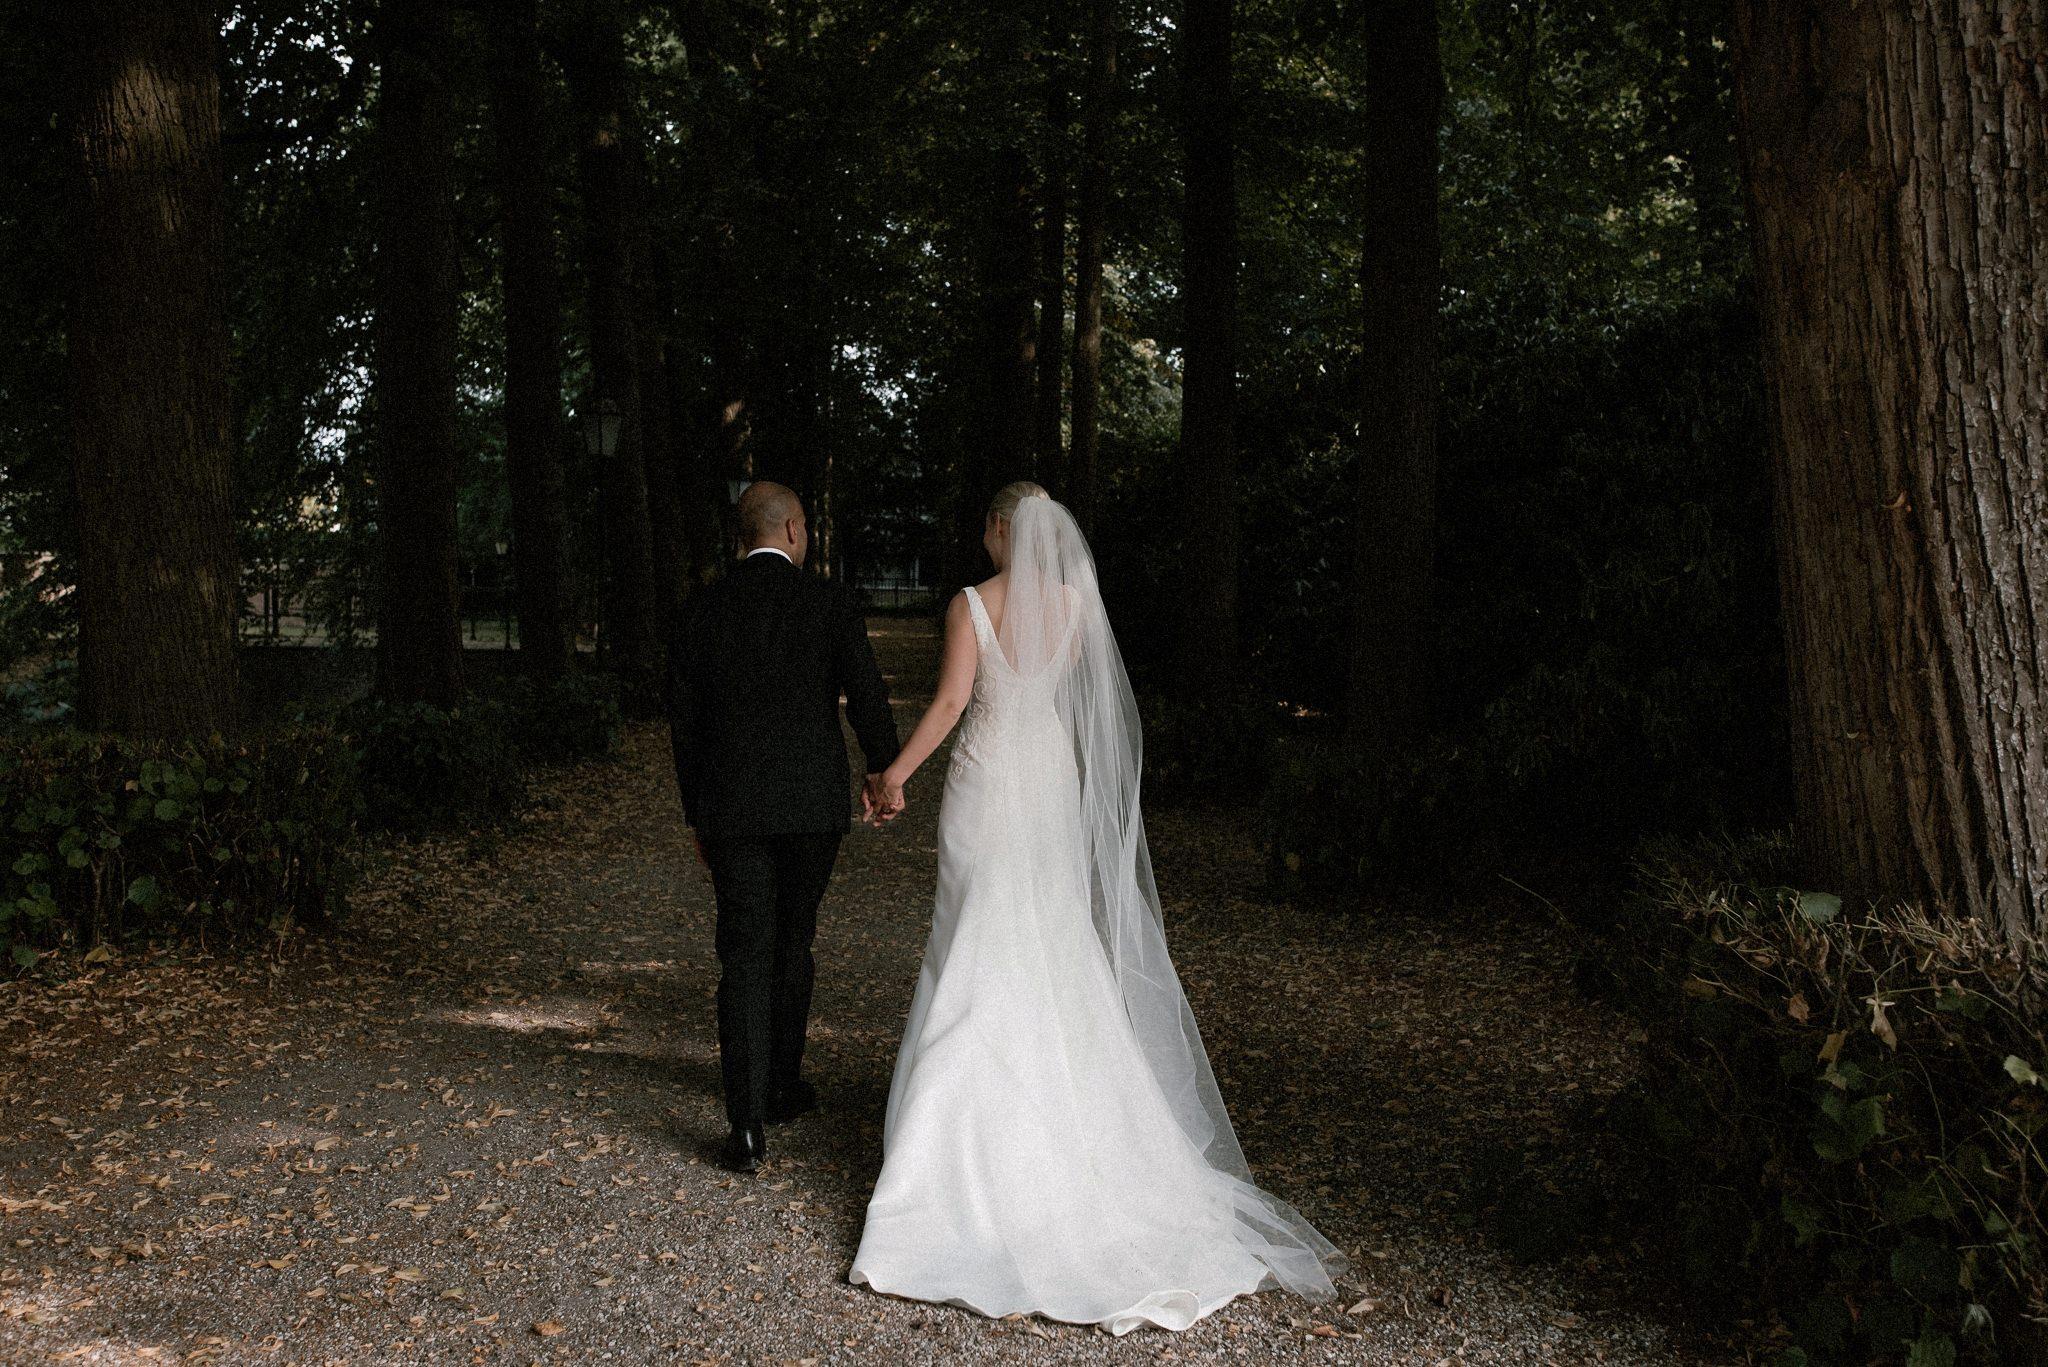 Bruidsfotografie Buitenplaats Sparrendaal - Naomi van der Kraan 0050.jpg